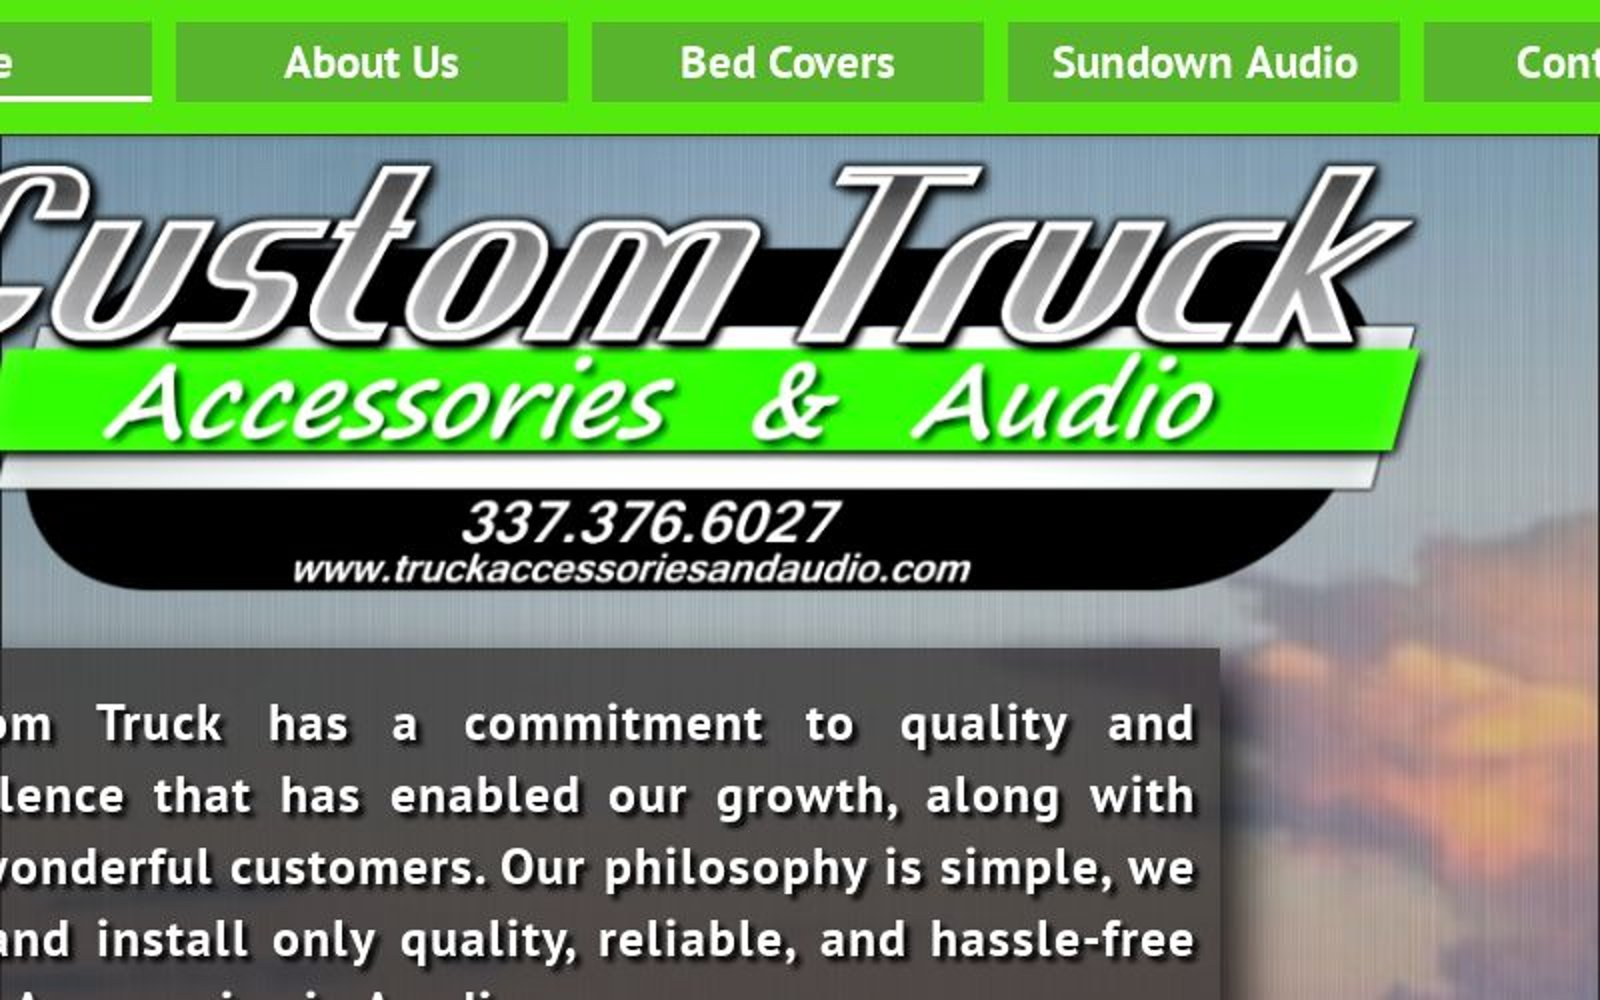 truckaccessories